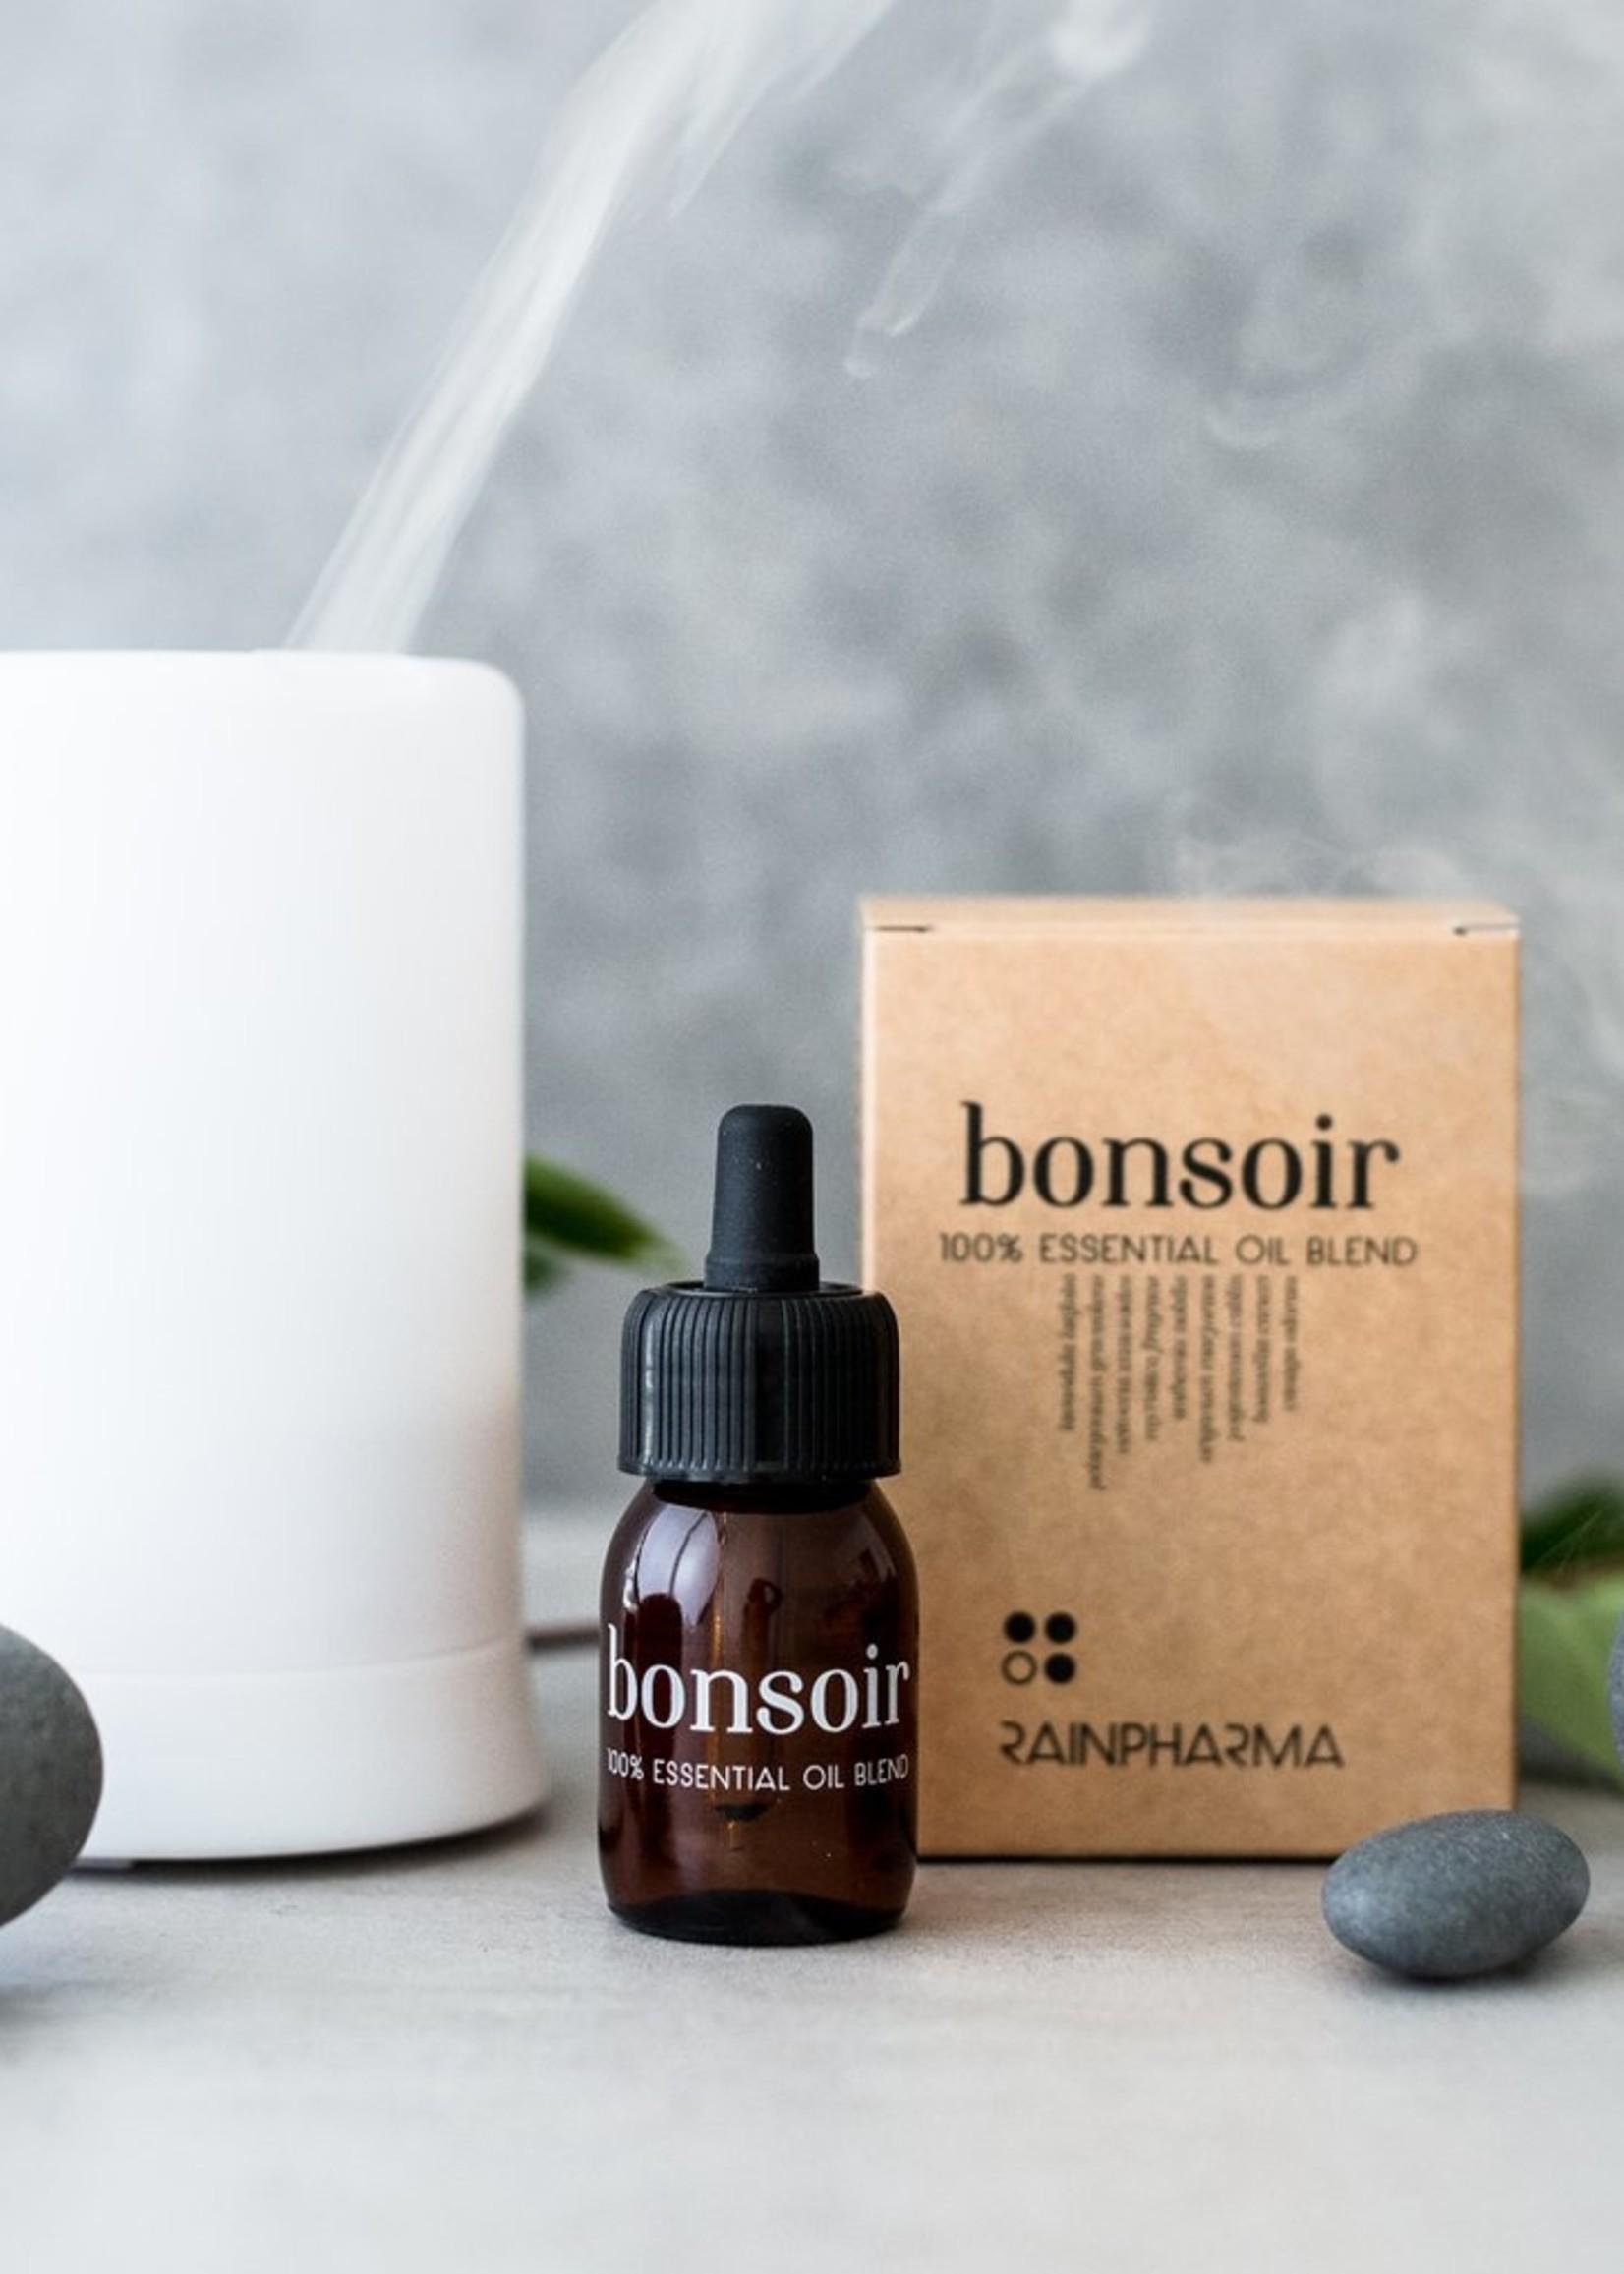 Rainpharma BONSOIR ESSENTIAL OIL BLEND